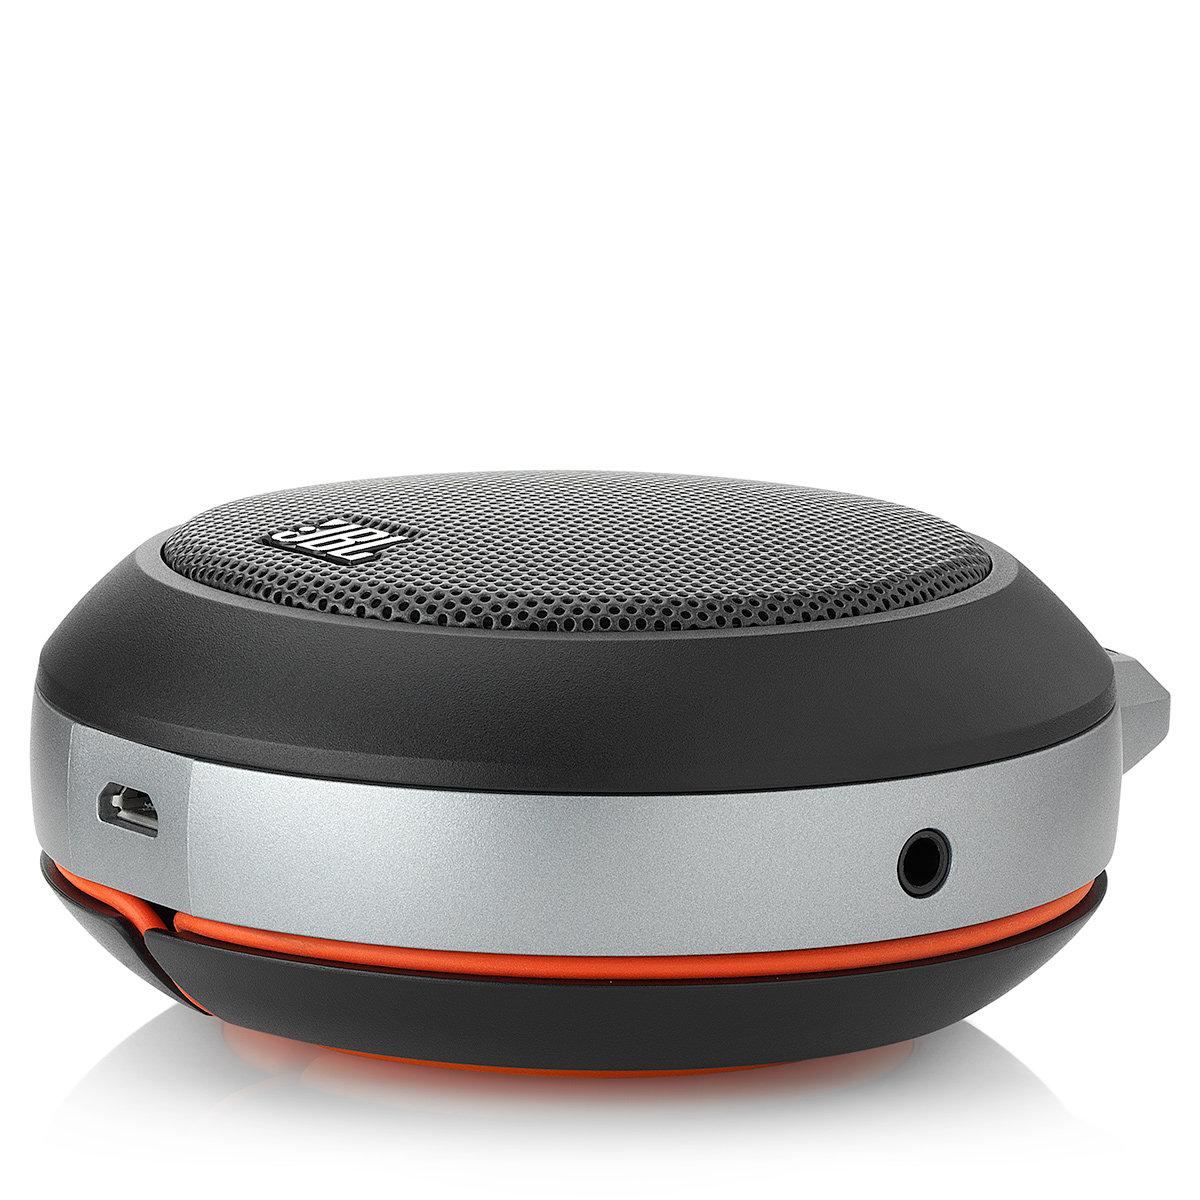 Amazon.com: JBL Micro II Ultra-Portable Multimedia Speaker